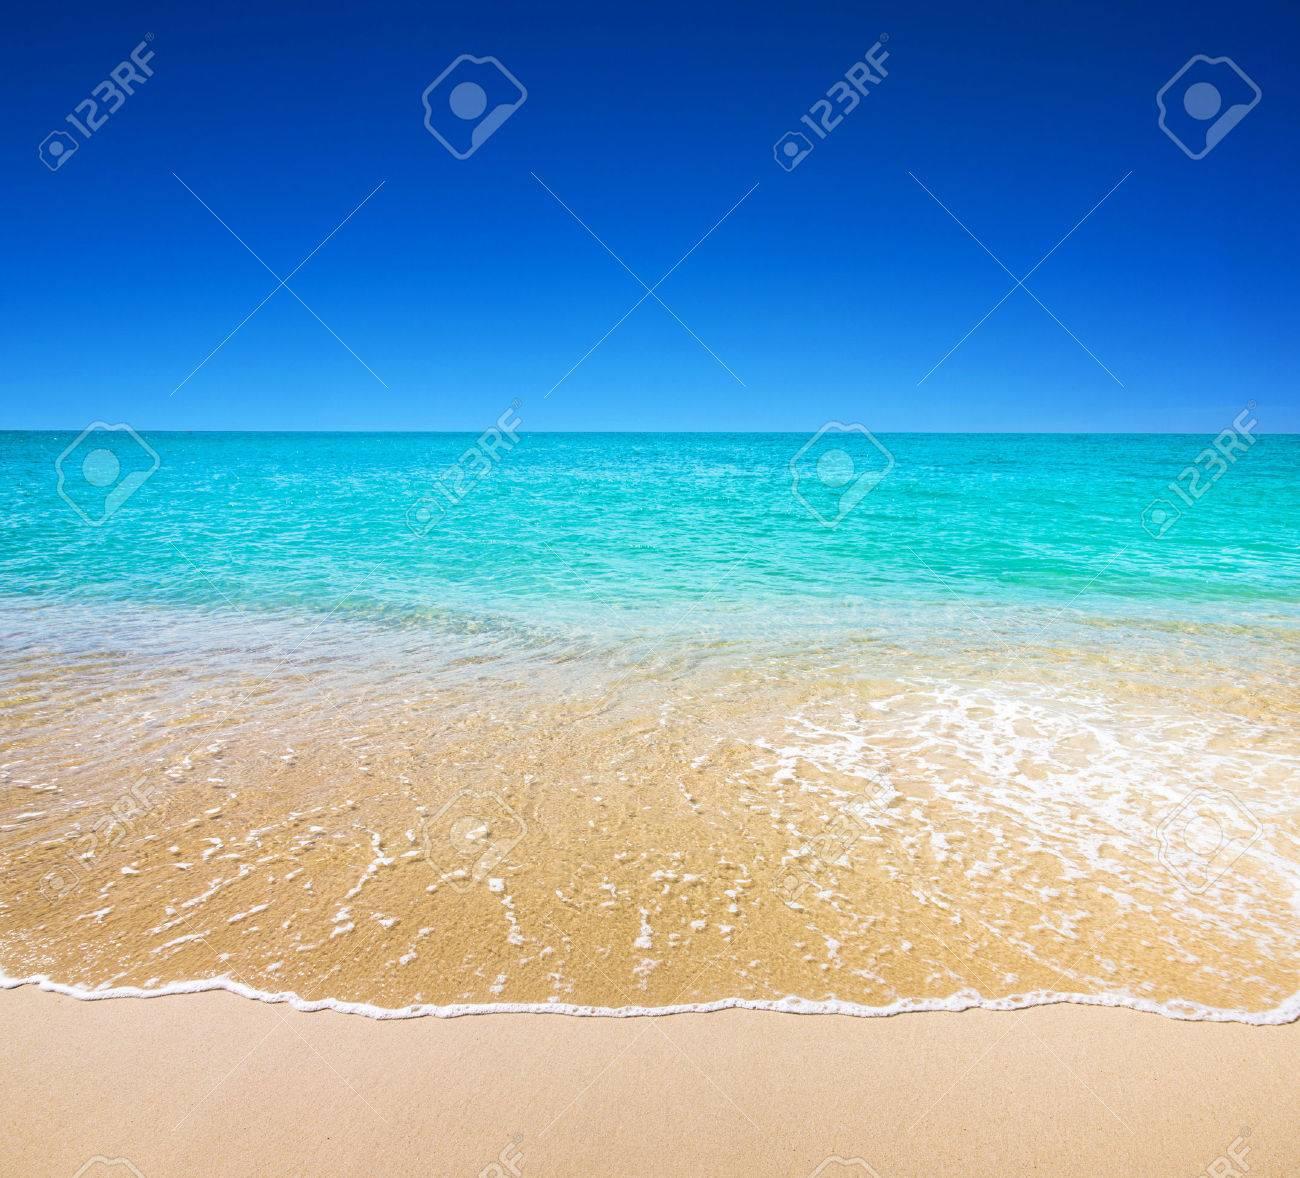 beautiful beach and tropical sea - 37008192